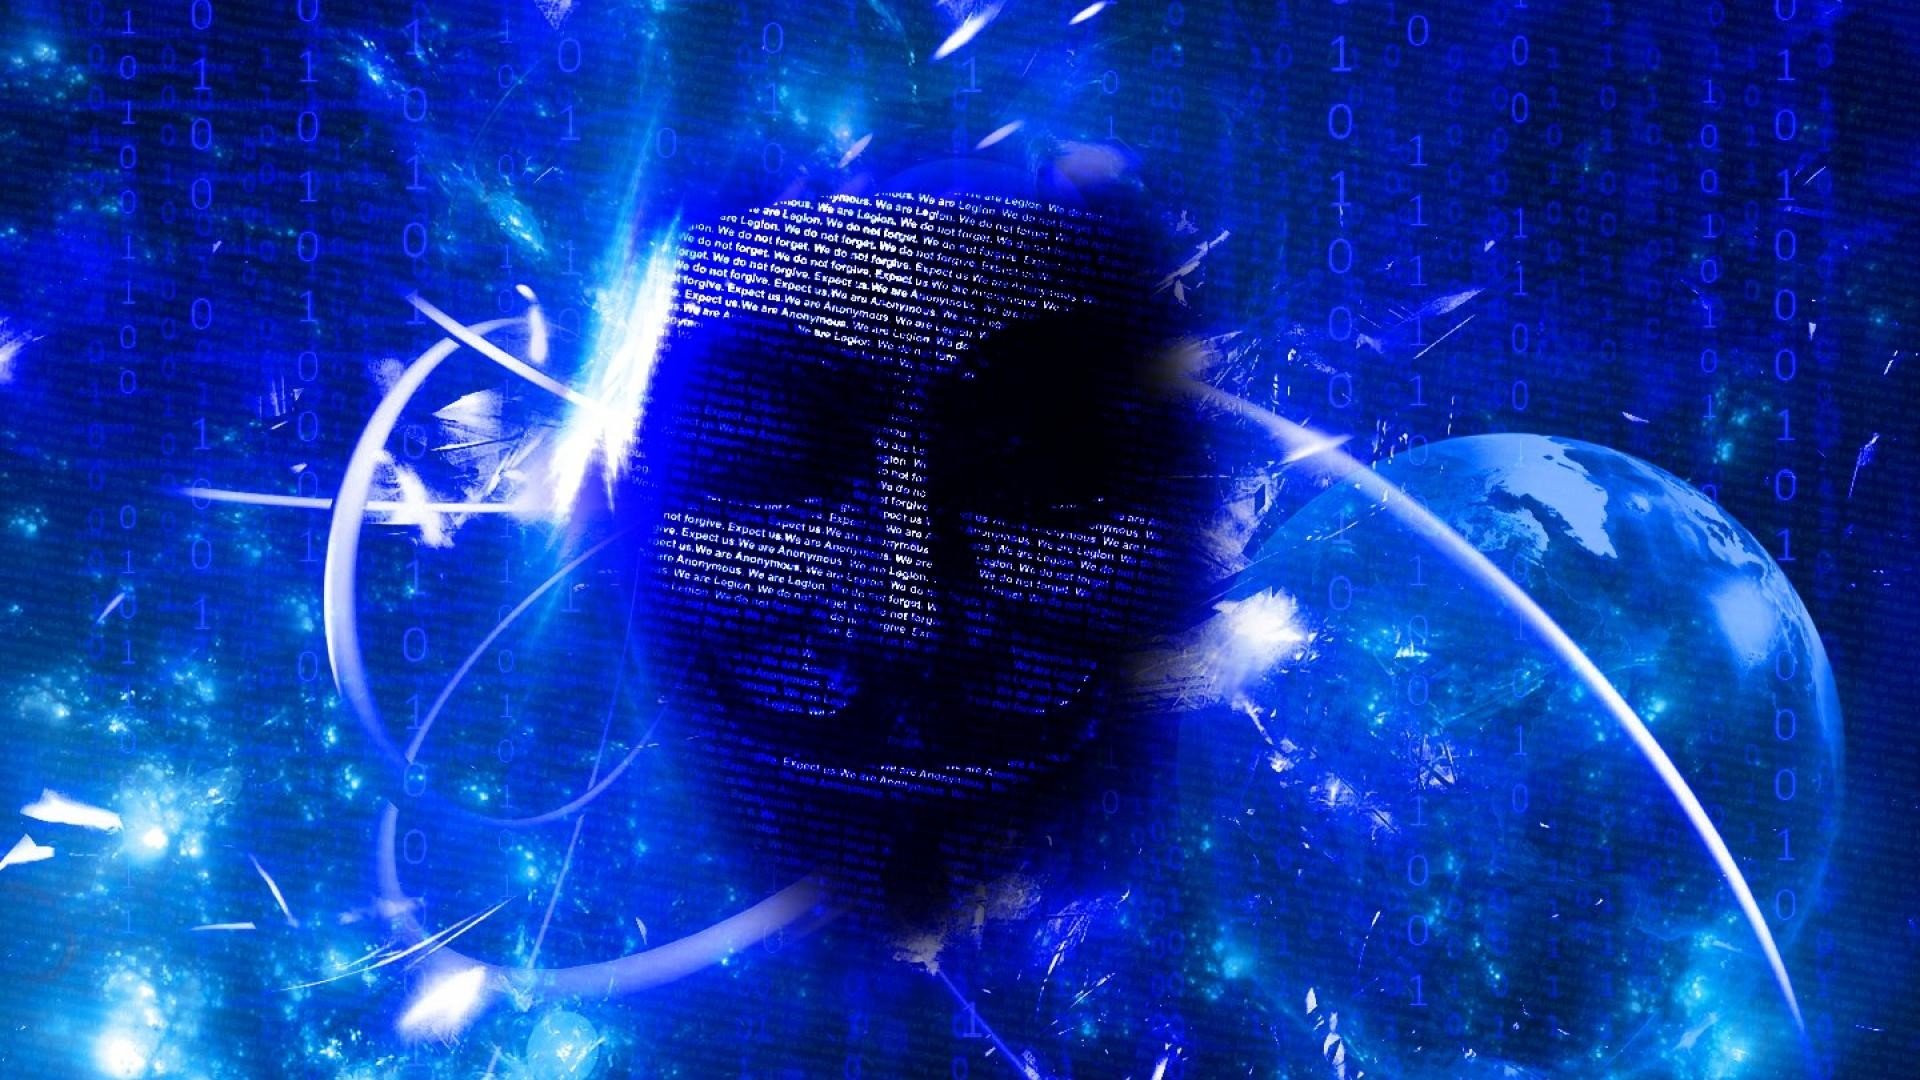 Abstract blue anonymous matrix binary code wallpaper